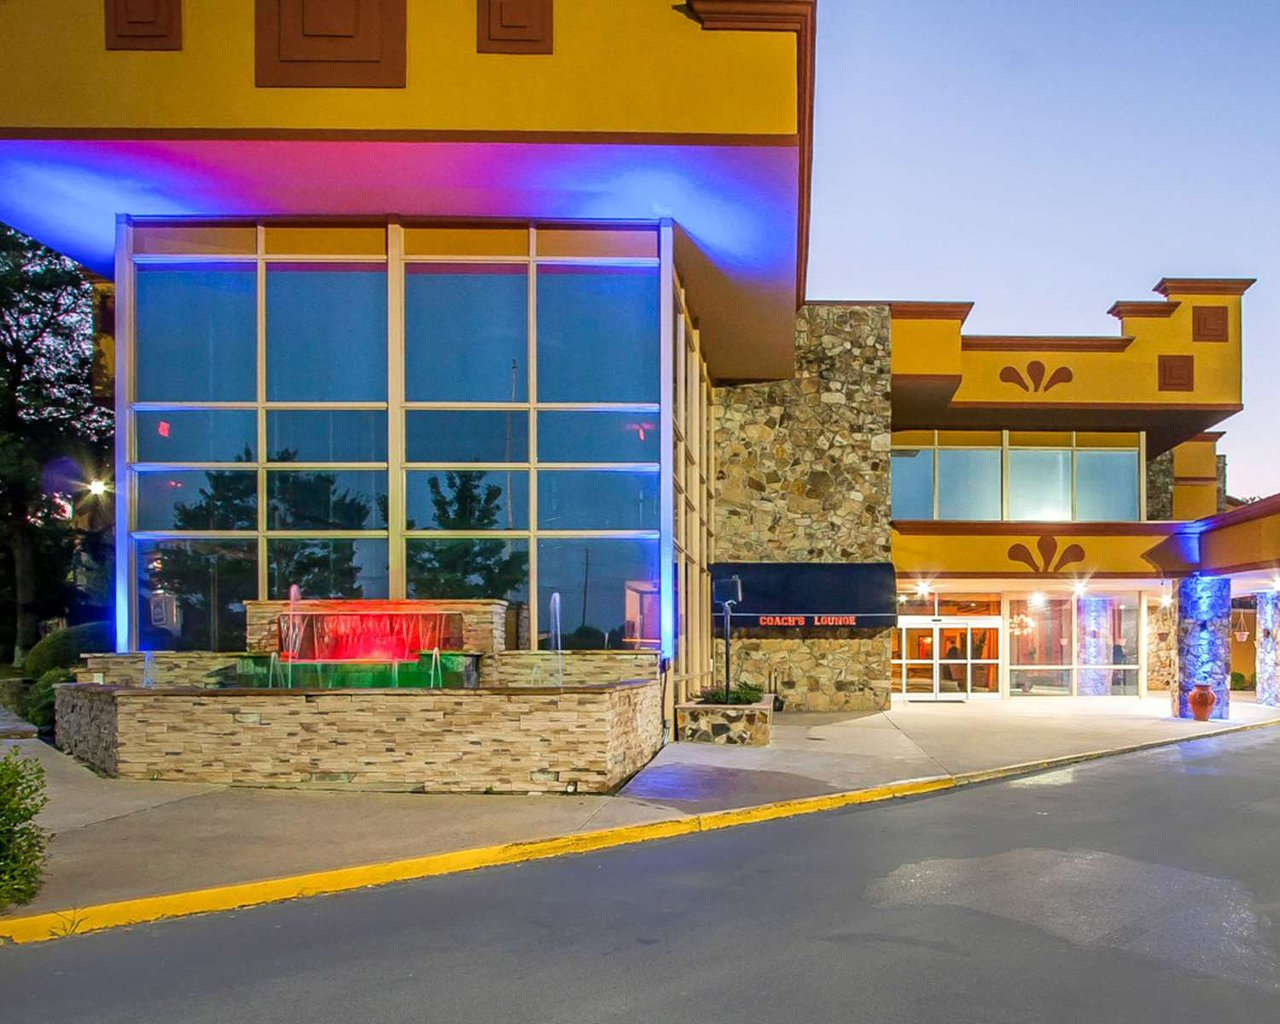 Clarion Inn Suites University Center 79 9 1 Prices Hotel Reviews Auburn Al Tripadvisor